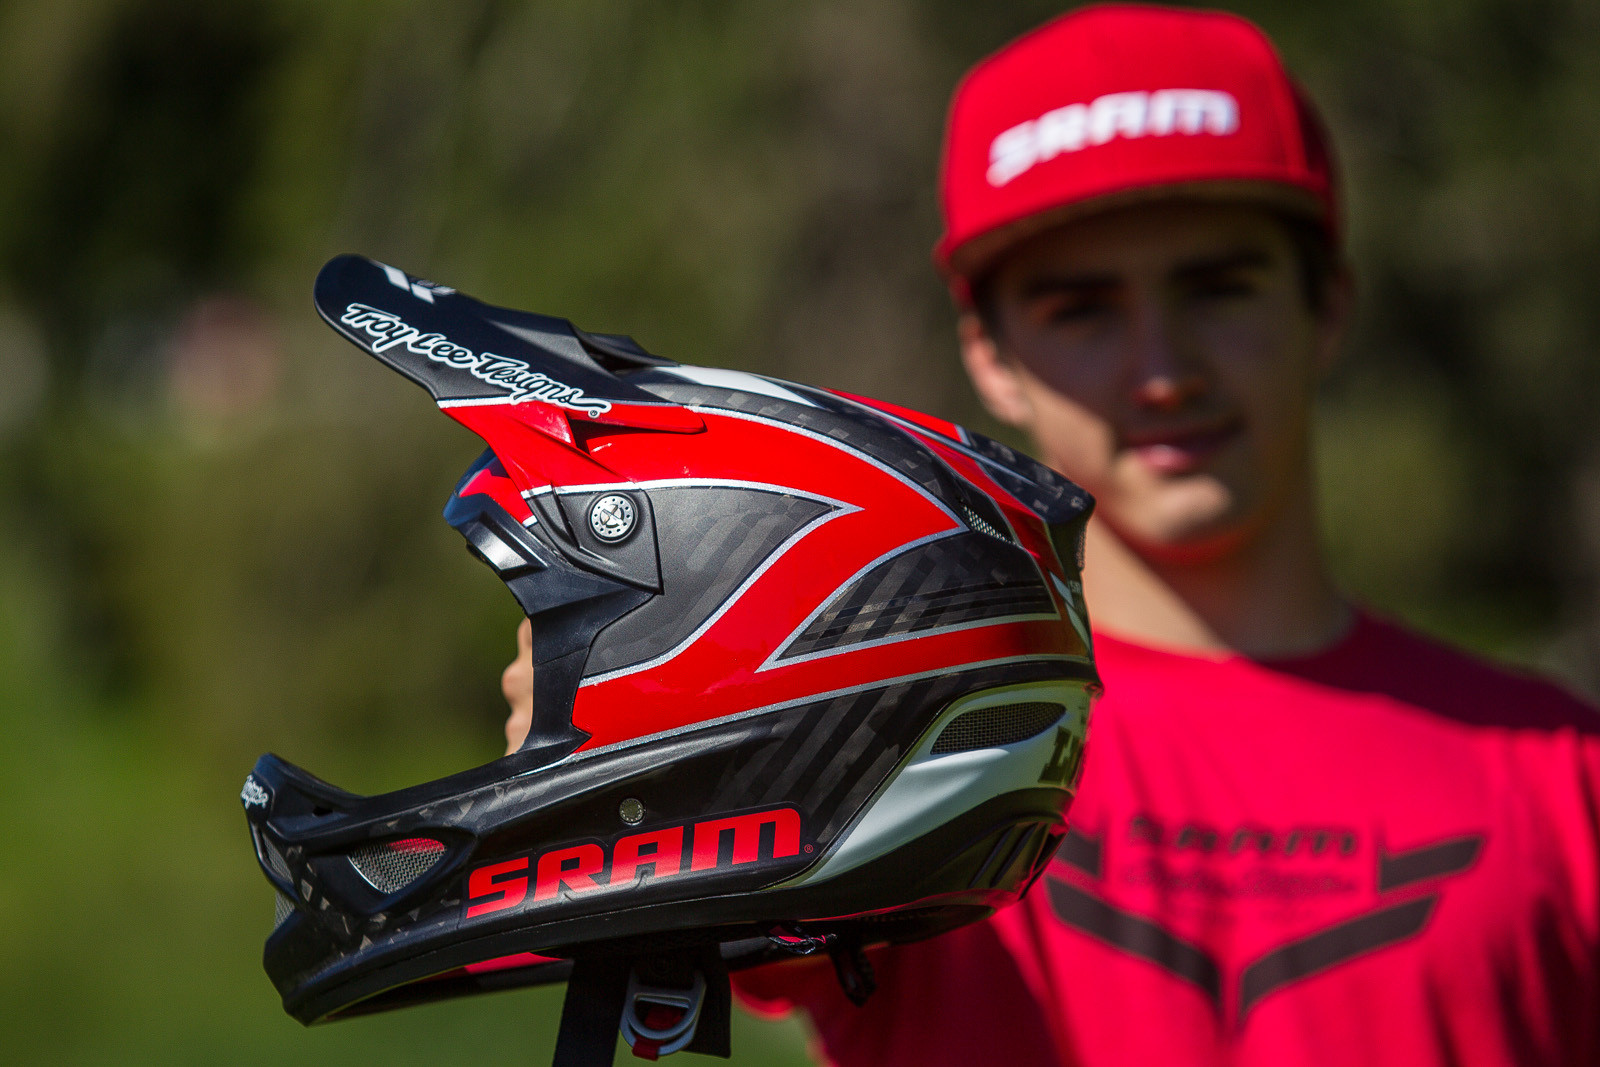 Luca Shaw's Troy Lee Designs D3 Helmet - PIT BITS - World Cup Lenzerheide, Switzerland - Mountain Biking Pictures - Vital MTB